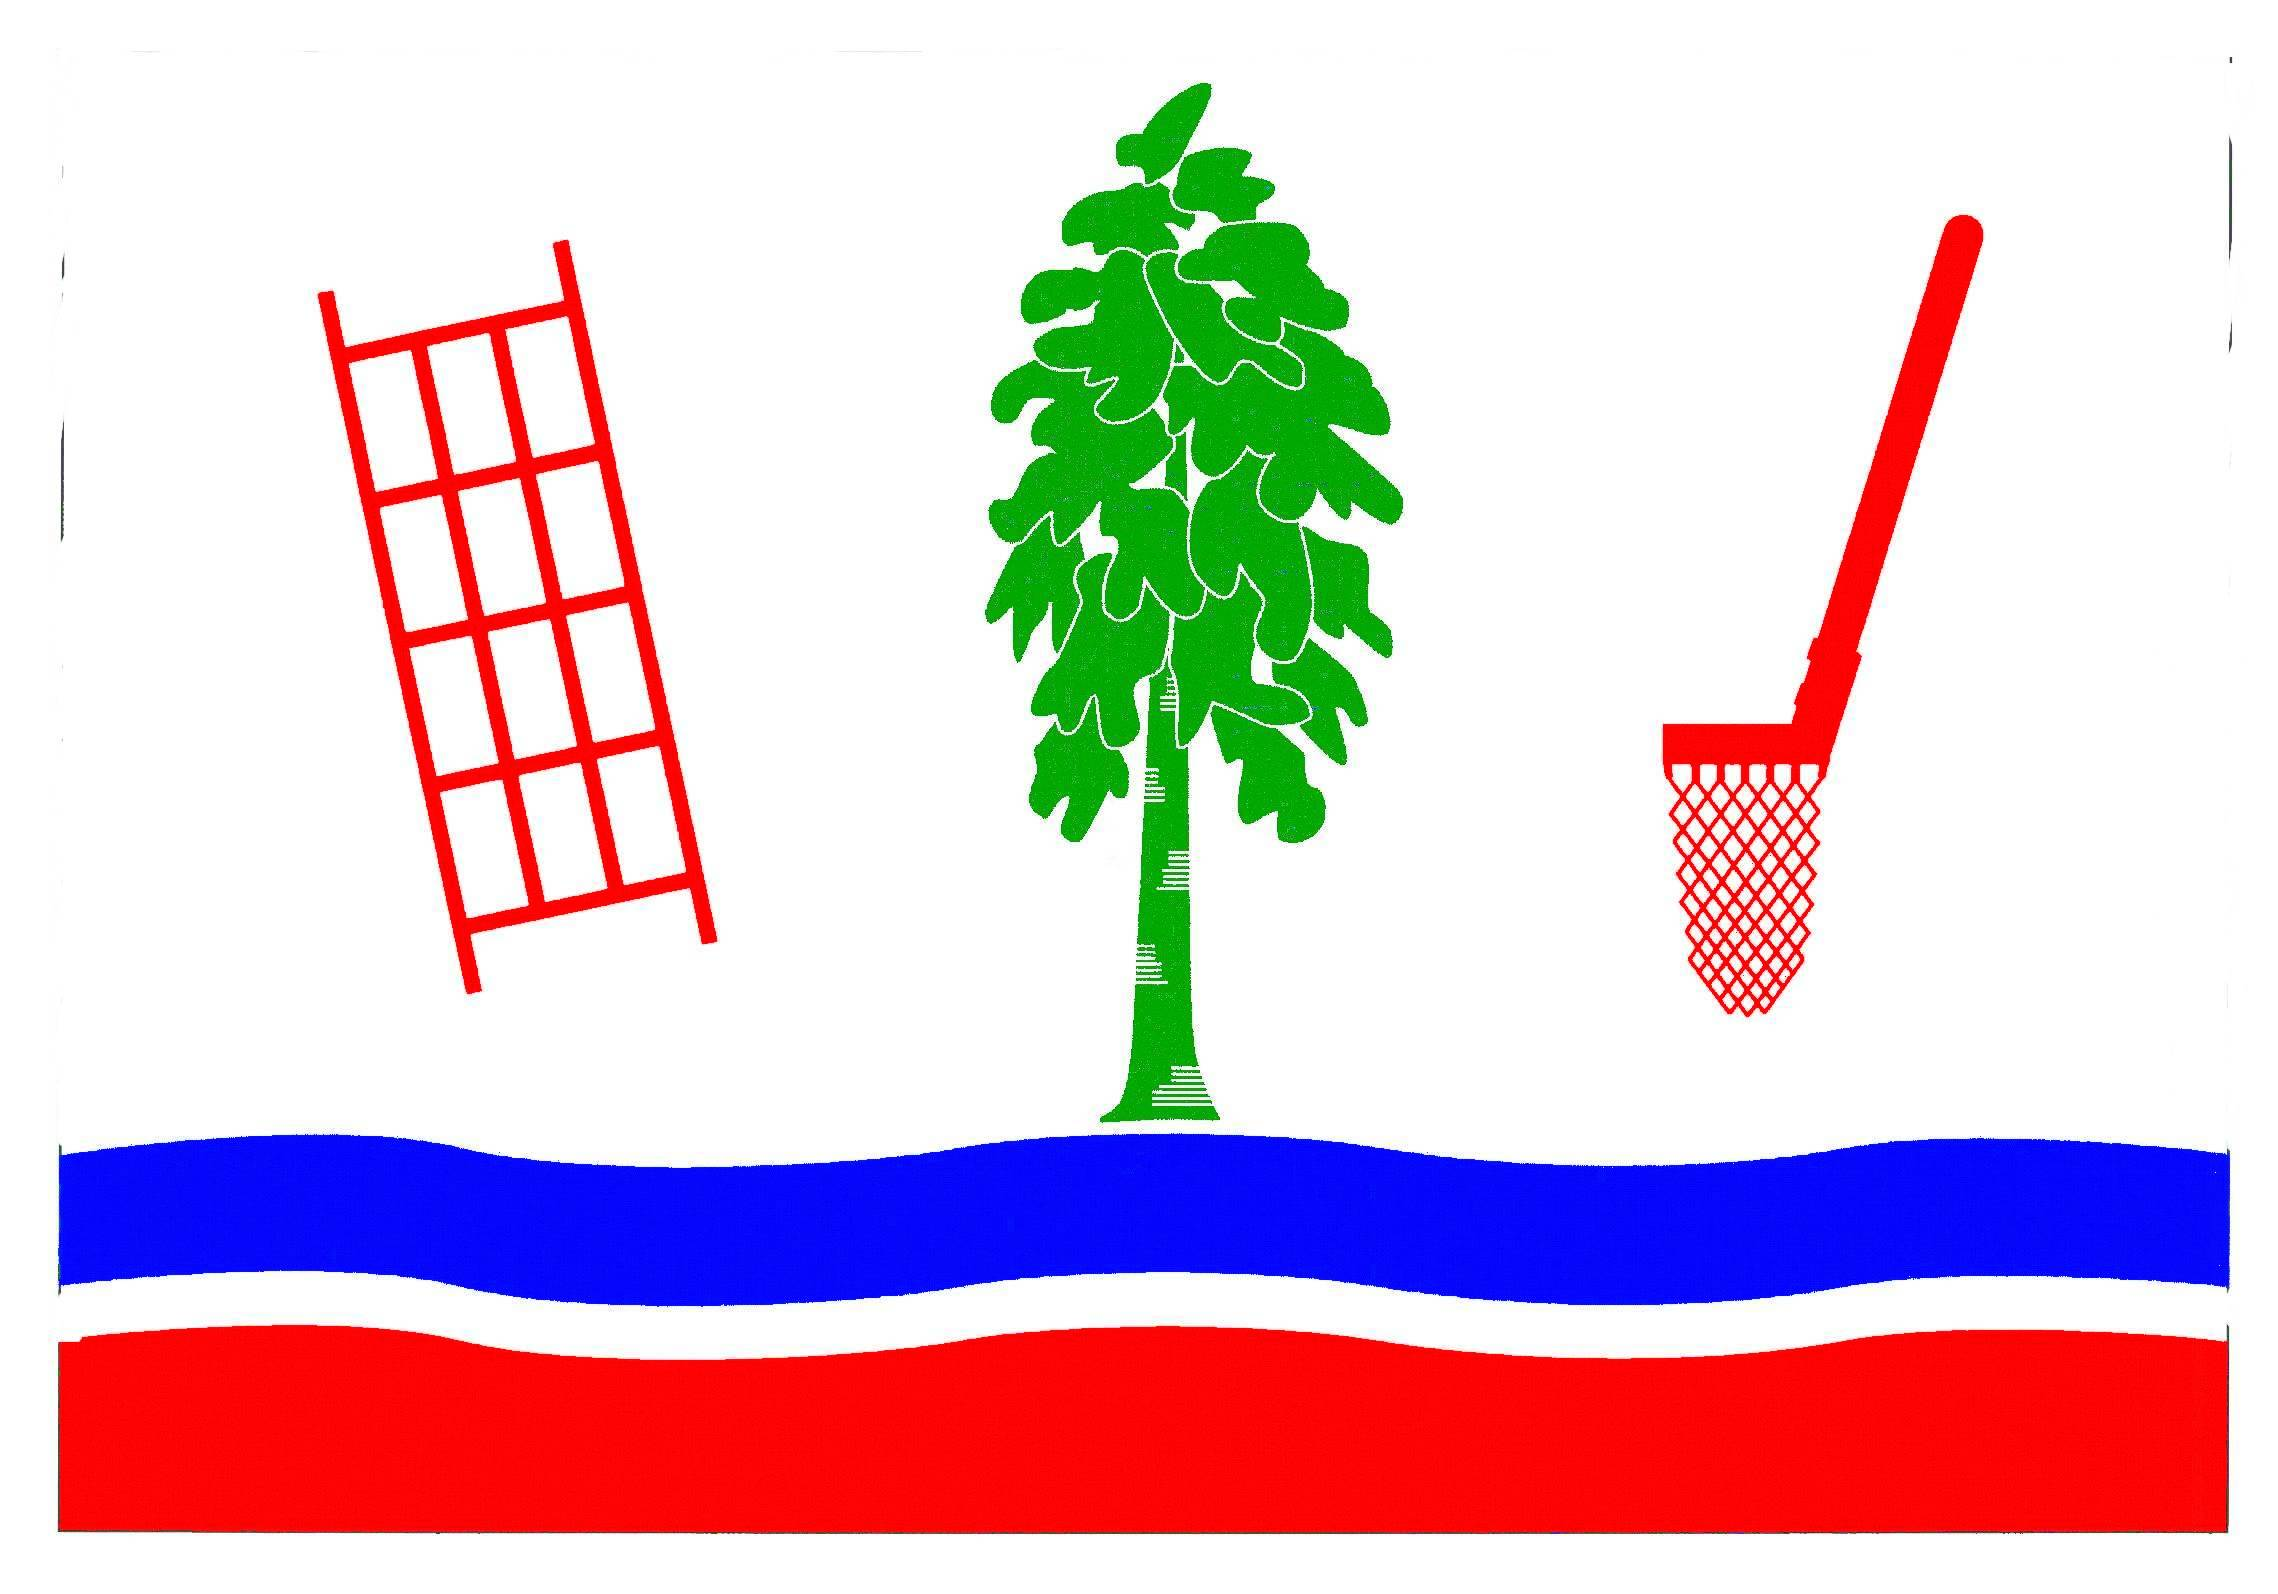 Flagge GemeindeKrempermoor, Kreis Steinburg